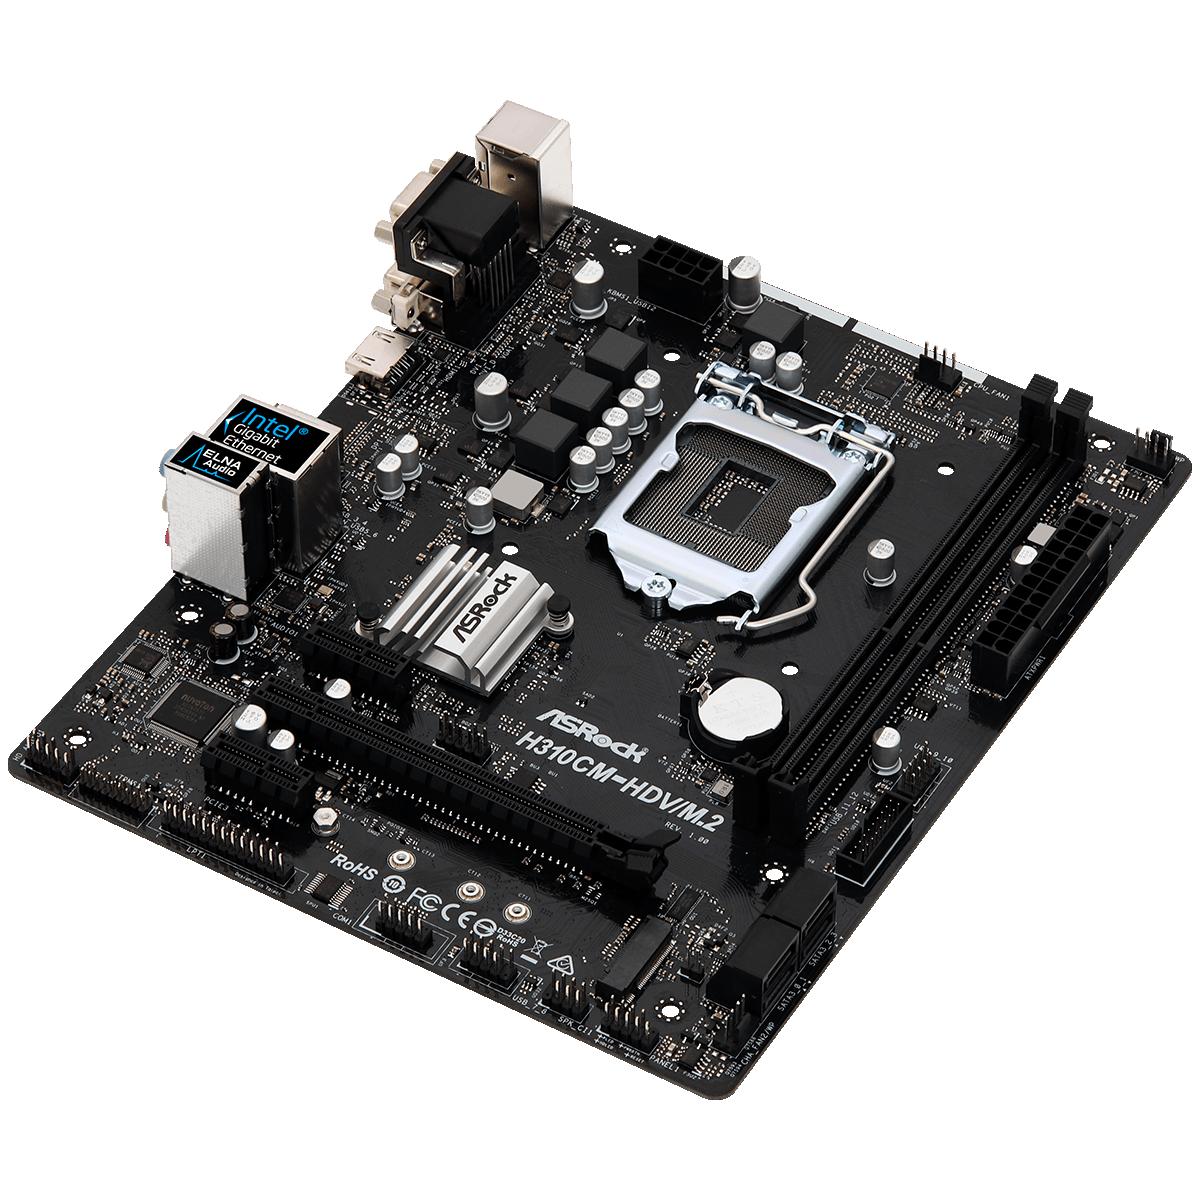 Placa Mãe ASRock H310CM-HDV/M.2, Chipset H310, Intel LGA 1151, mATX, DDR4